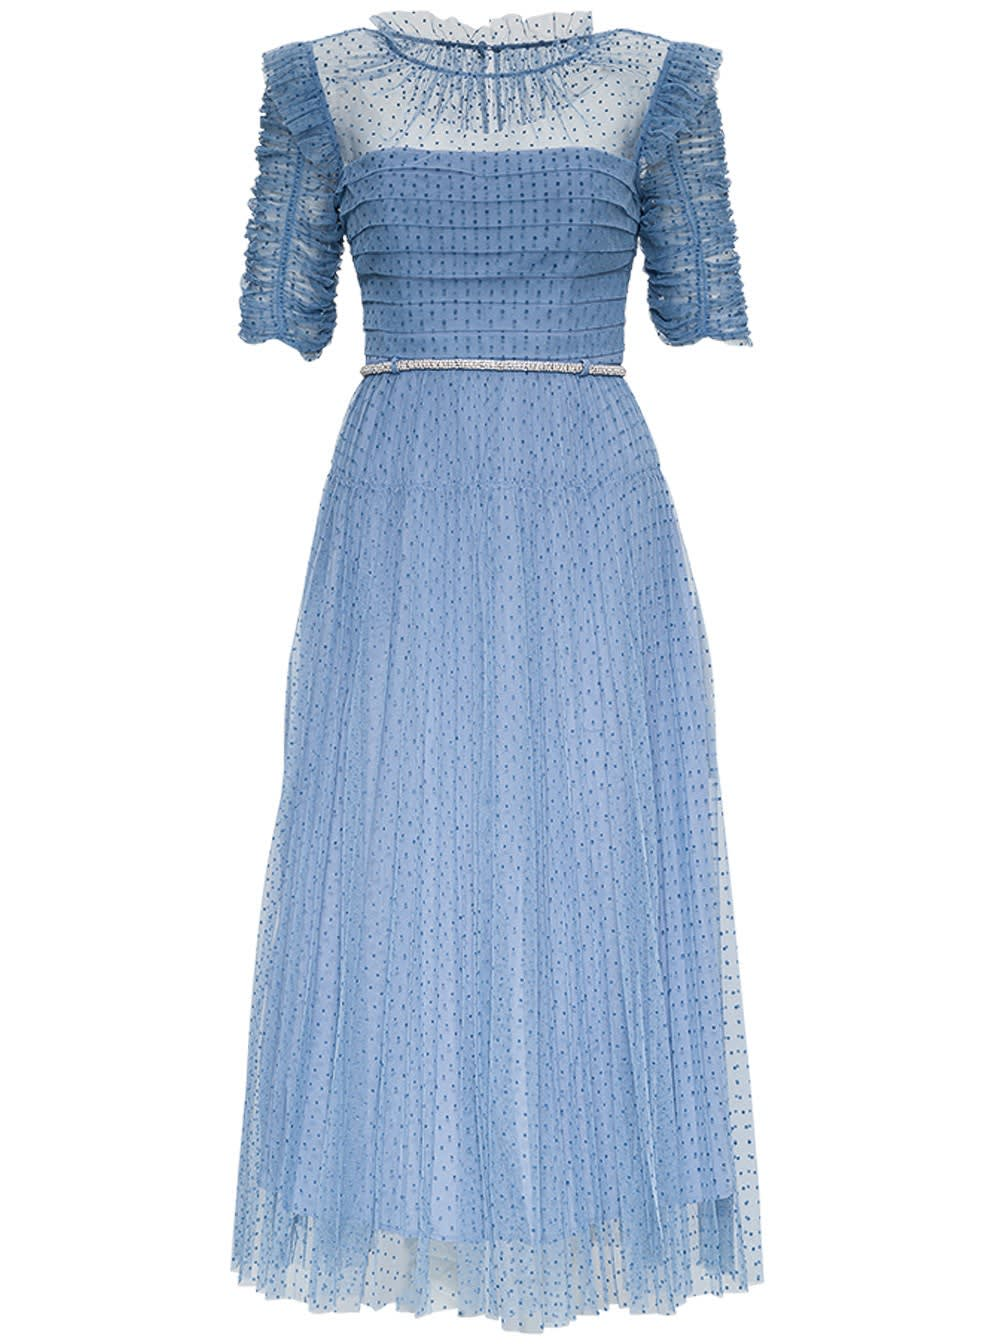 Self-Portrait LONG DRESS IN LIGHT BLUE POLKA DOTTULLE